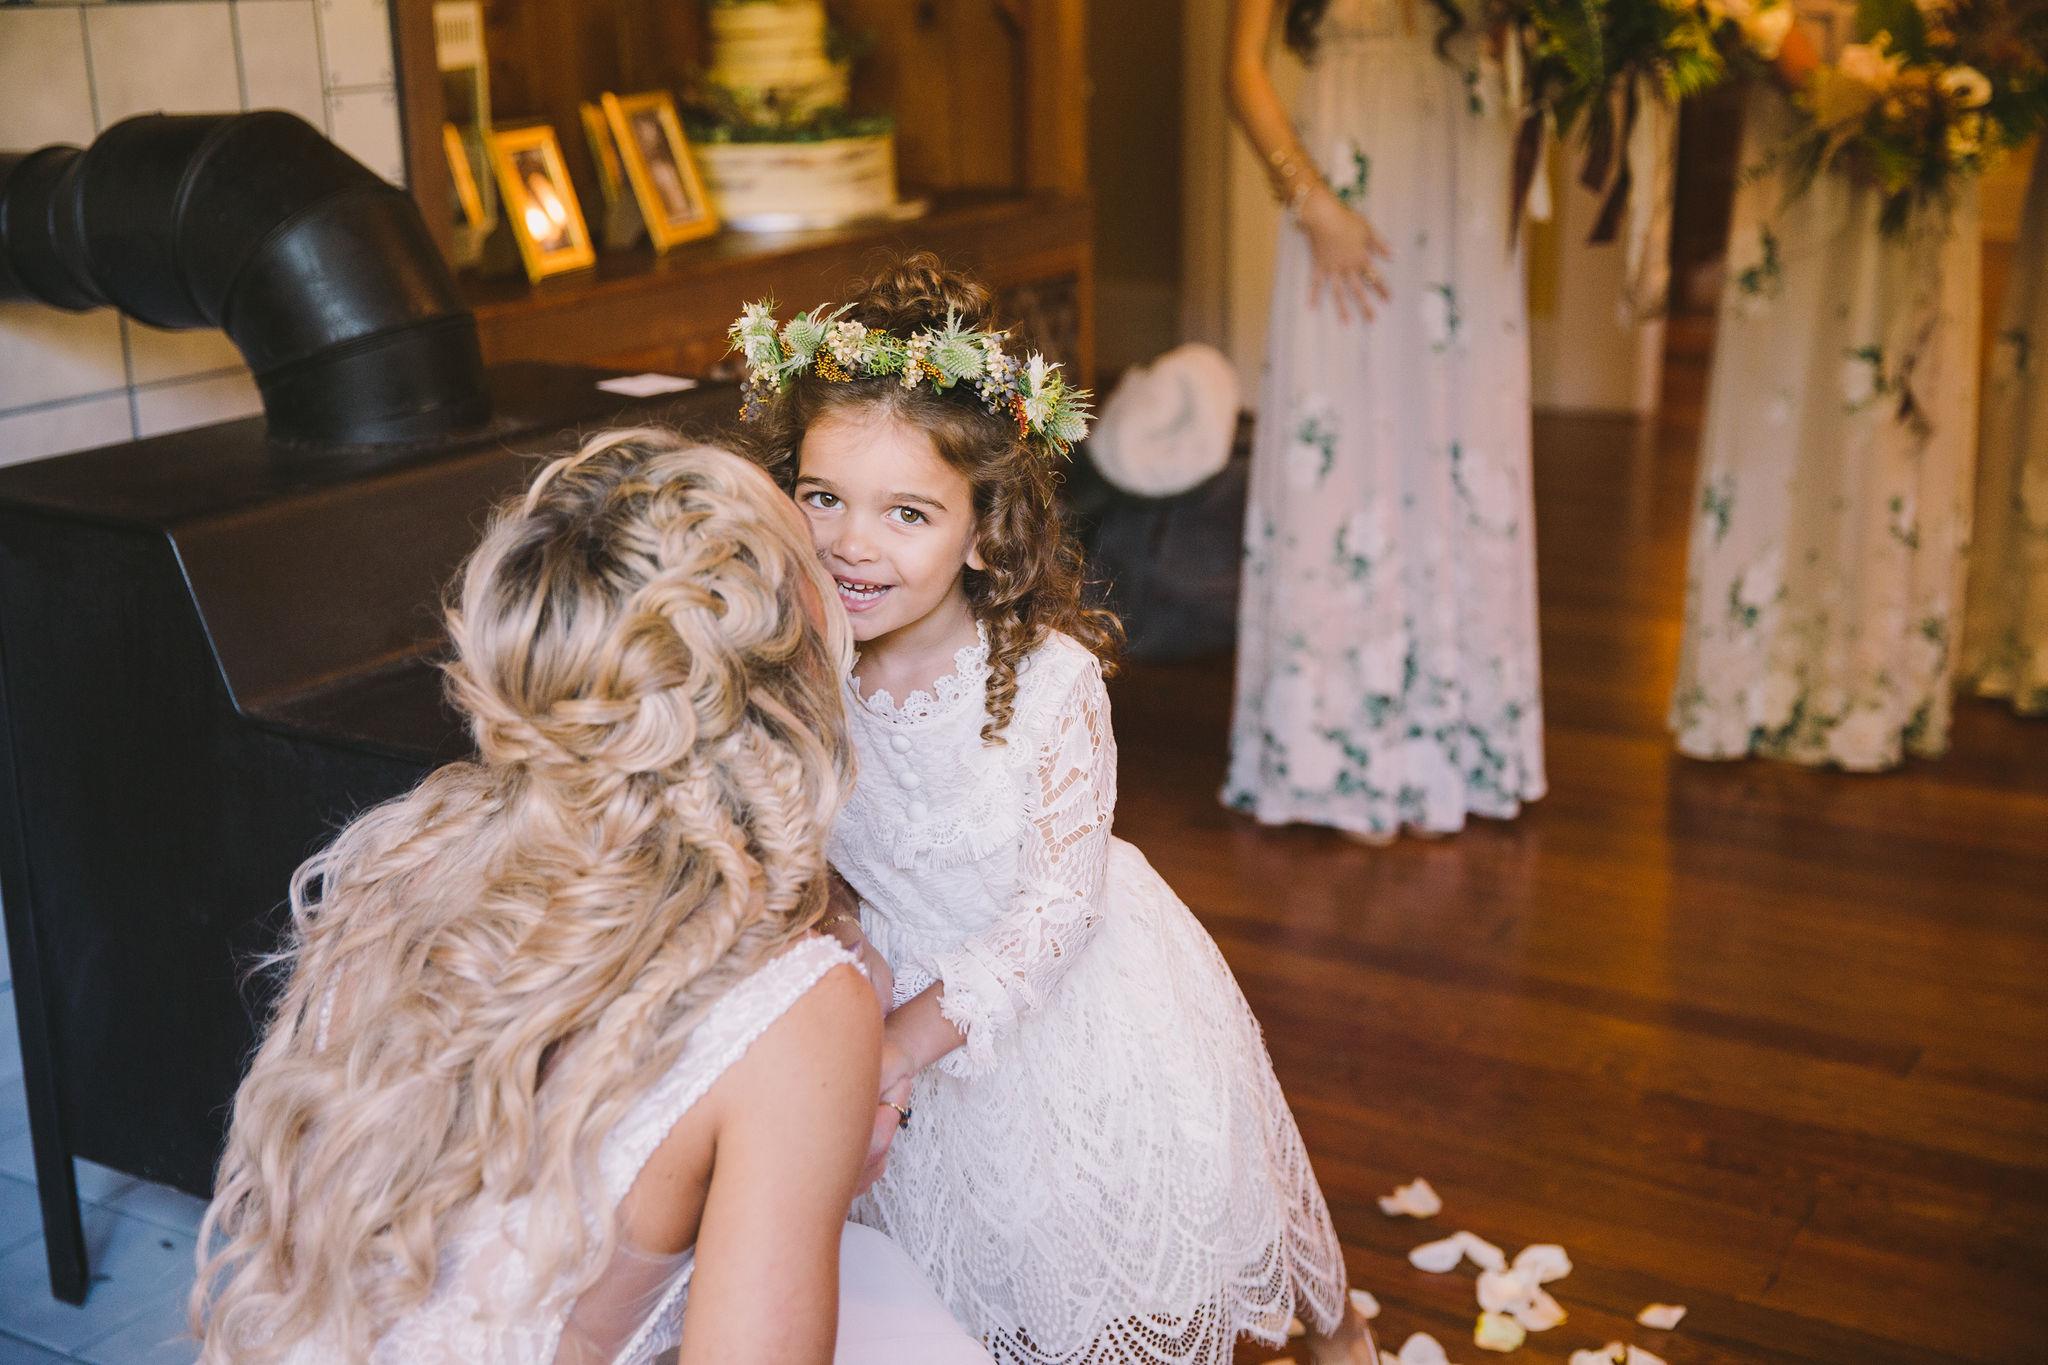 Jesseandlex_181103_AlexisNate_Wedding_GirlsPrep_181.jpg